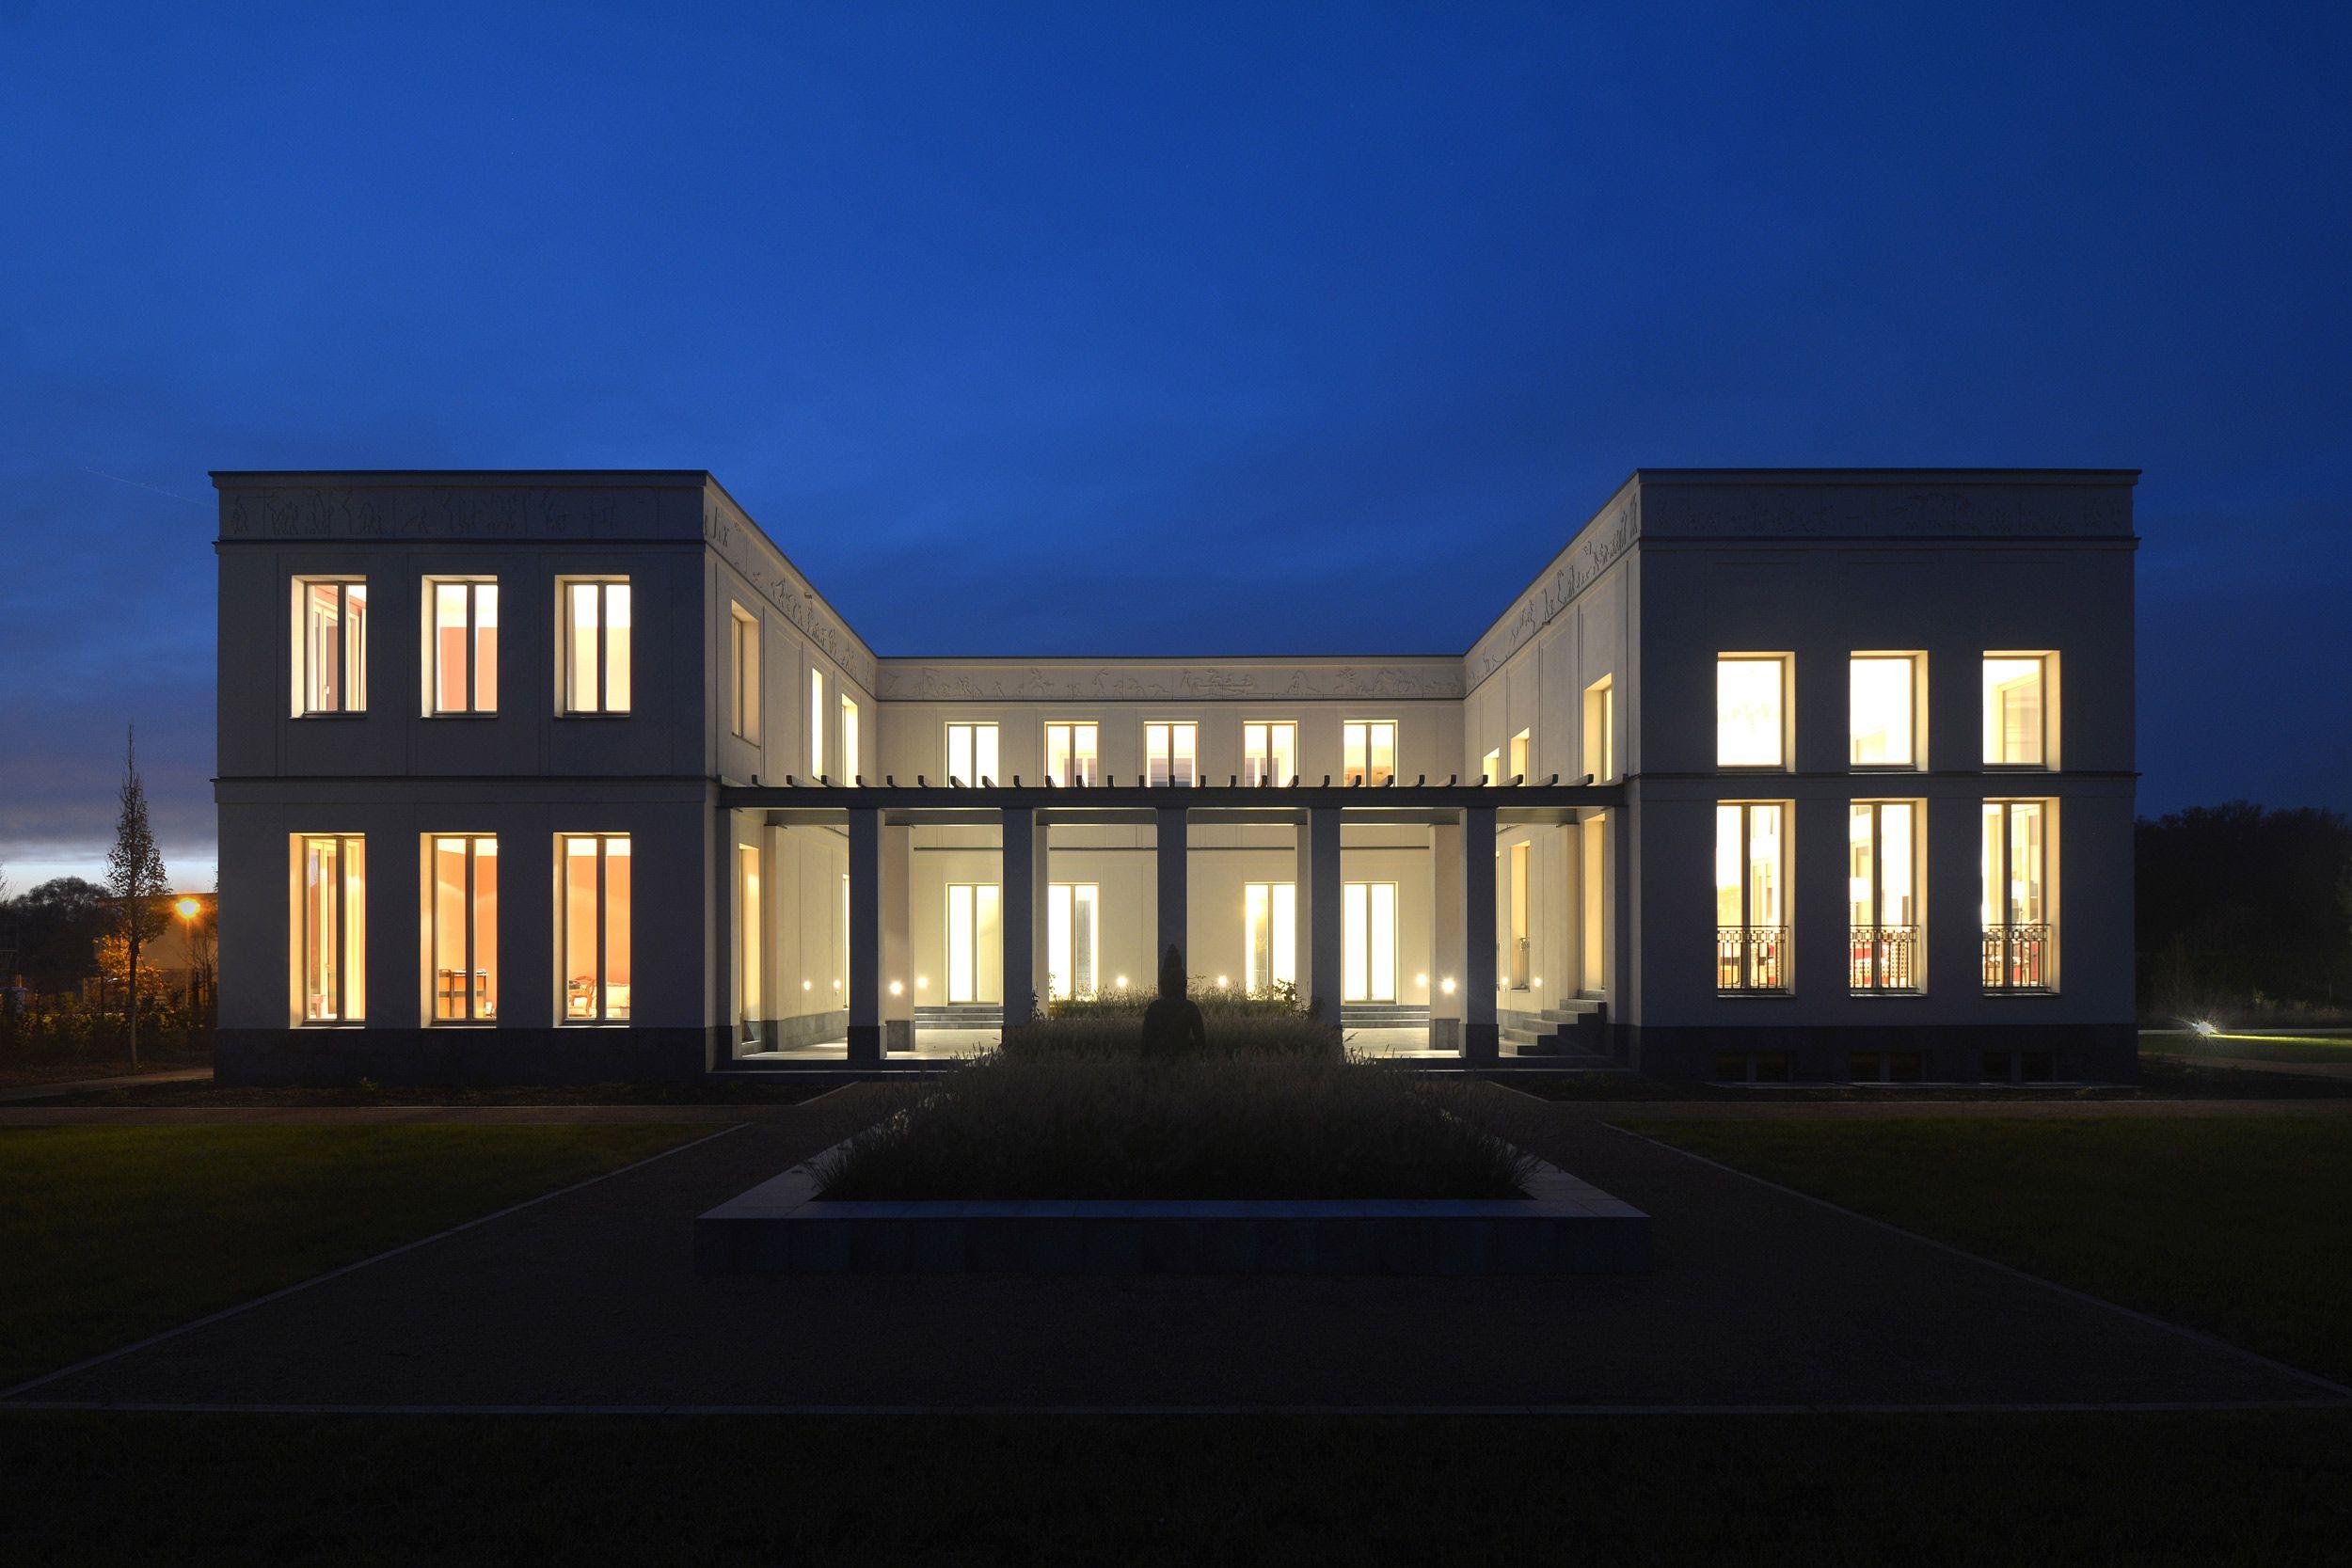 exklusive villa in potsdam jungfernsee vogel cg. Black Bedroom Furniture Sets. Home Design Ideas